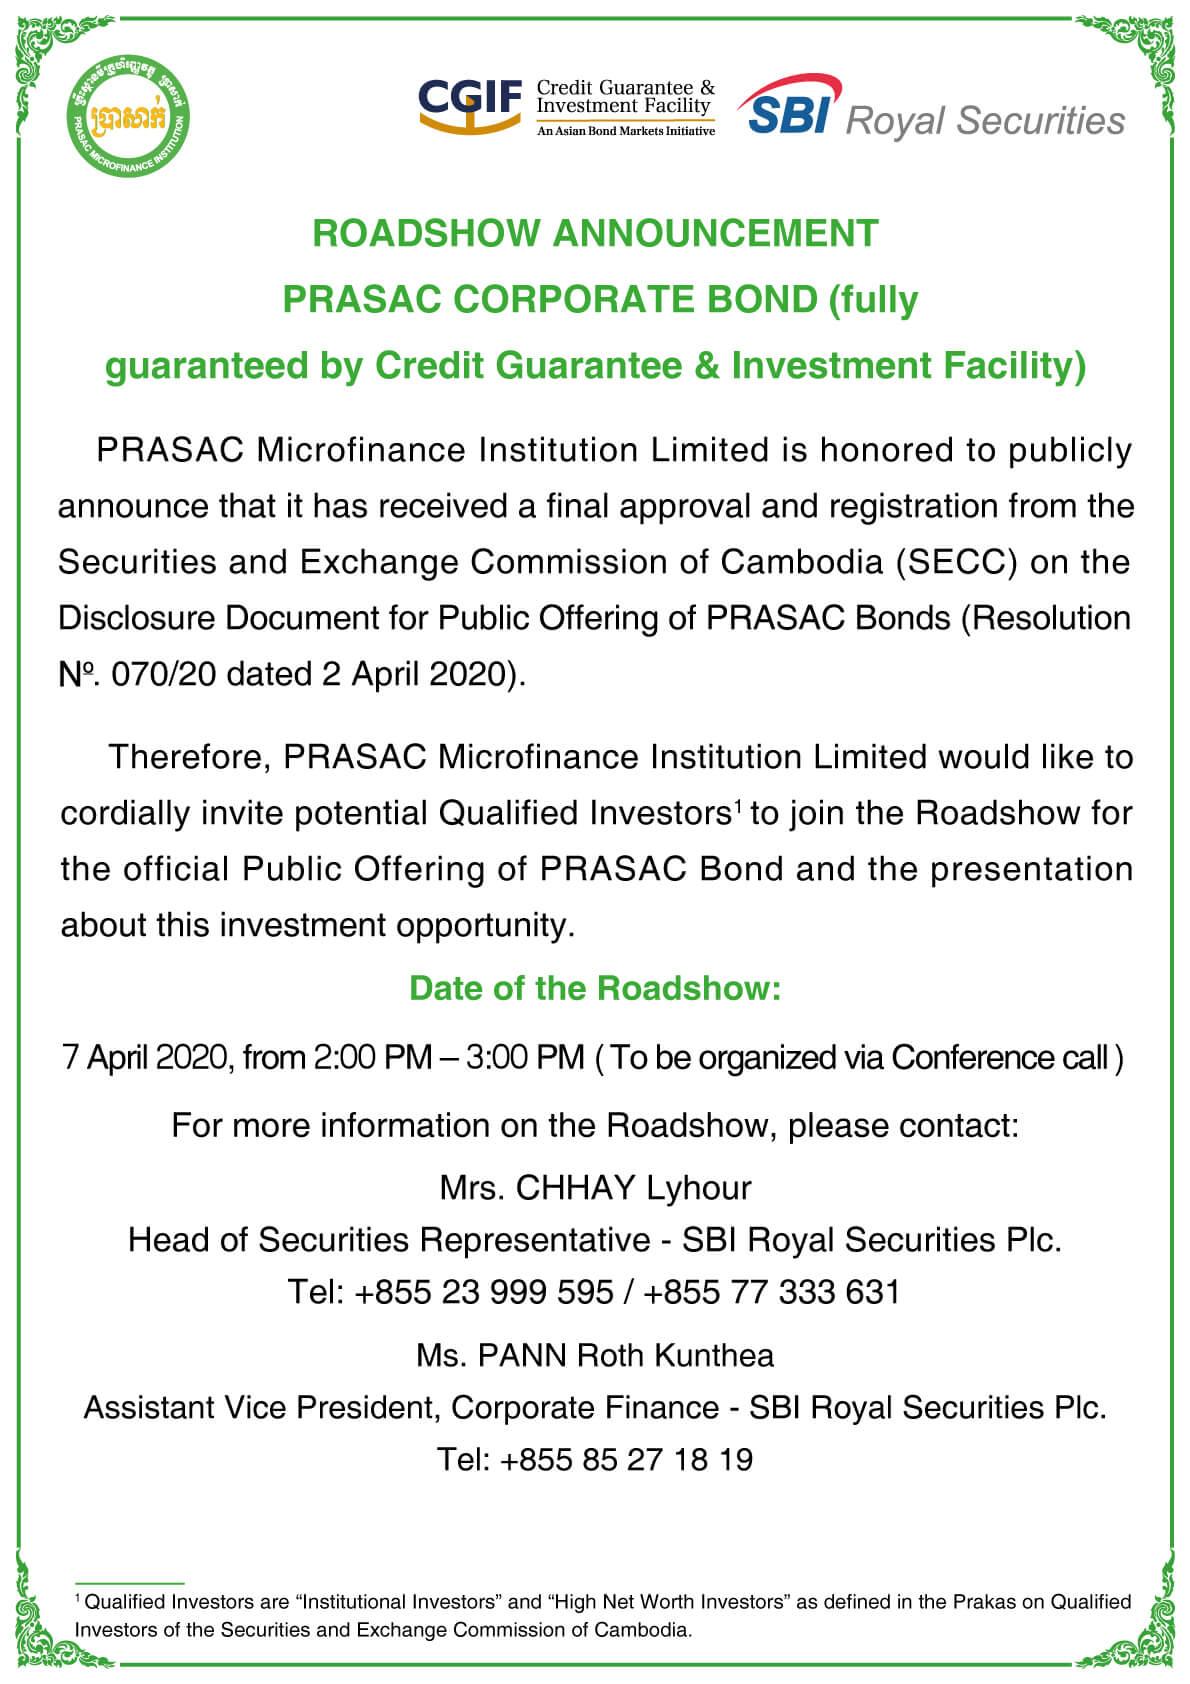 ROADSHOW ANNOUNCEMENT ON PRASAC CORPORATE BOND